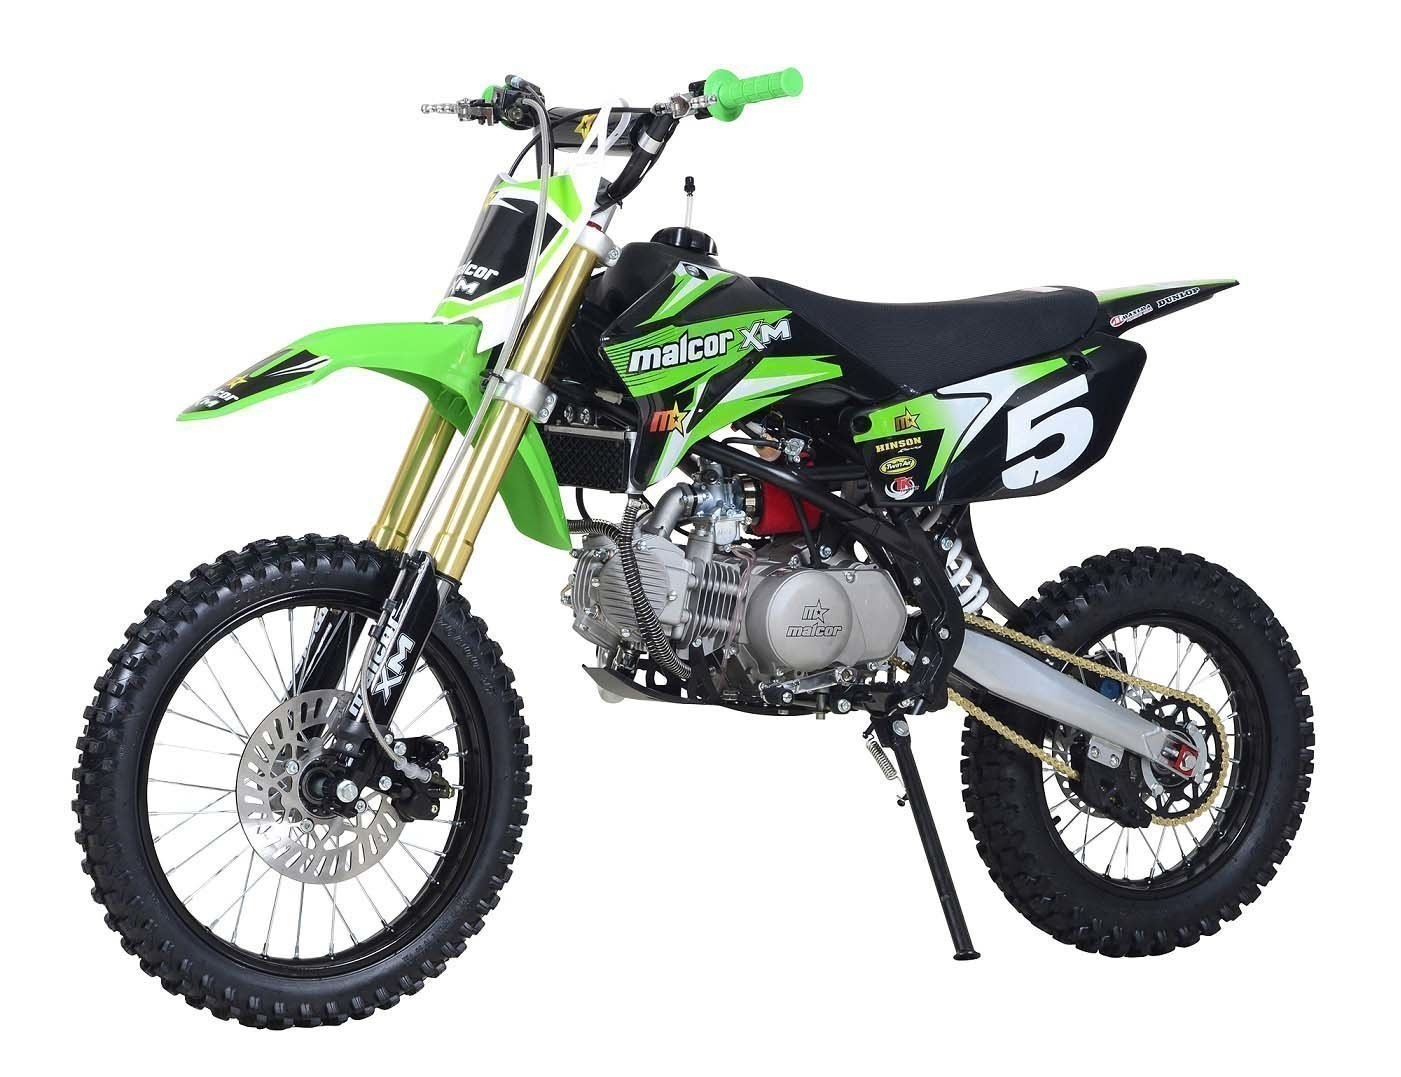 mtr malcor xm160 verde pit bike de rueda alta